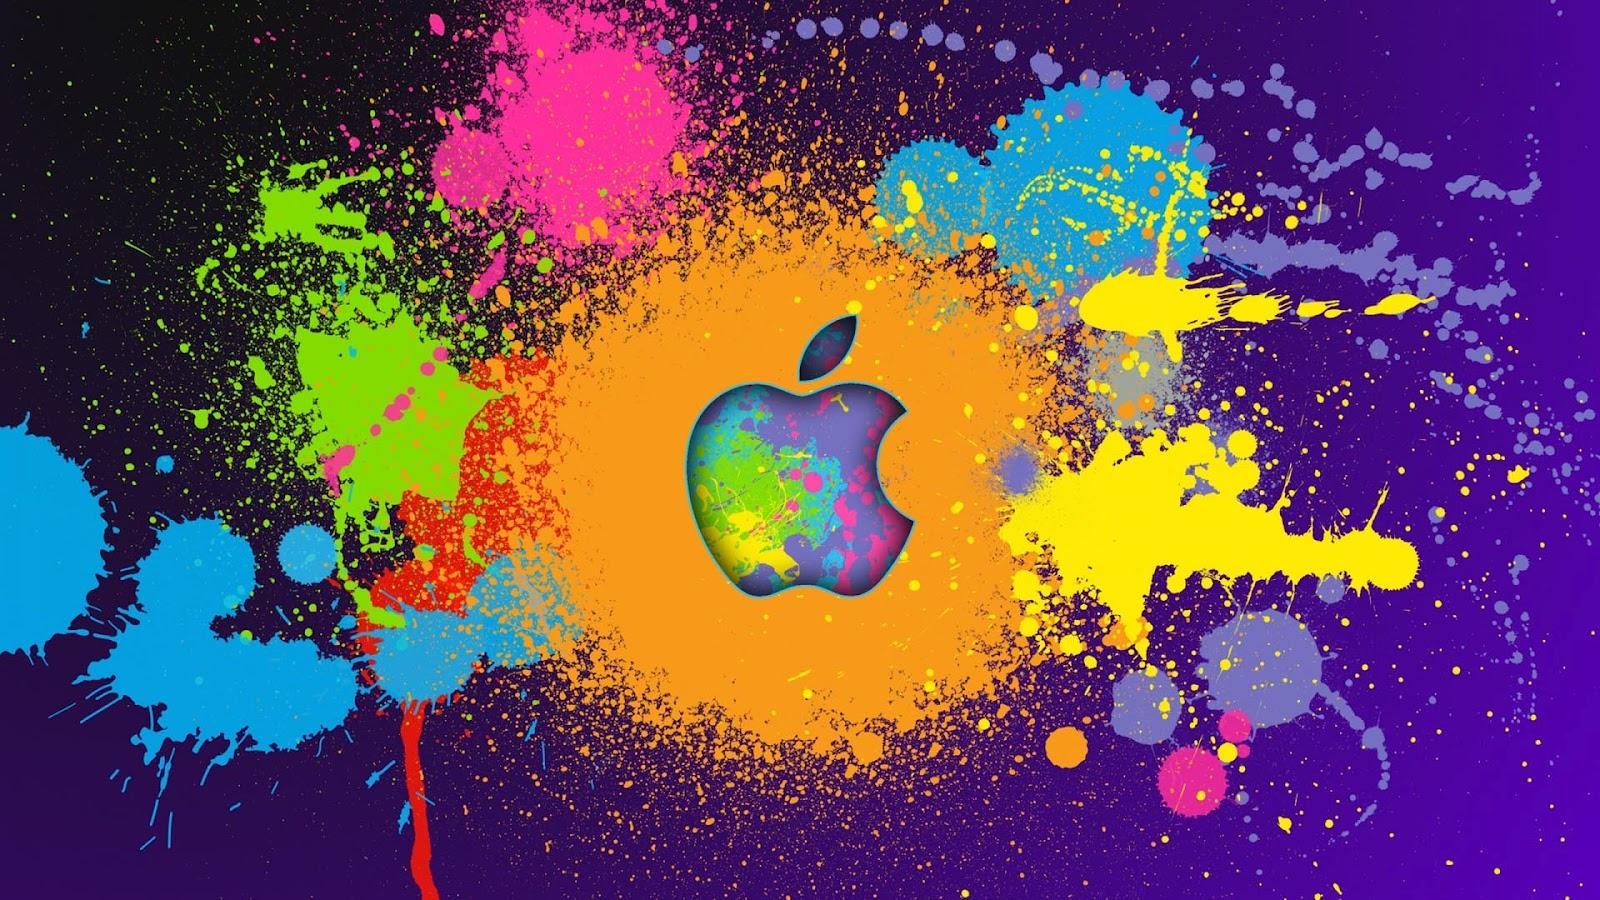 apple wallpaper download free